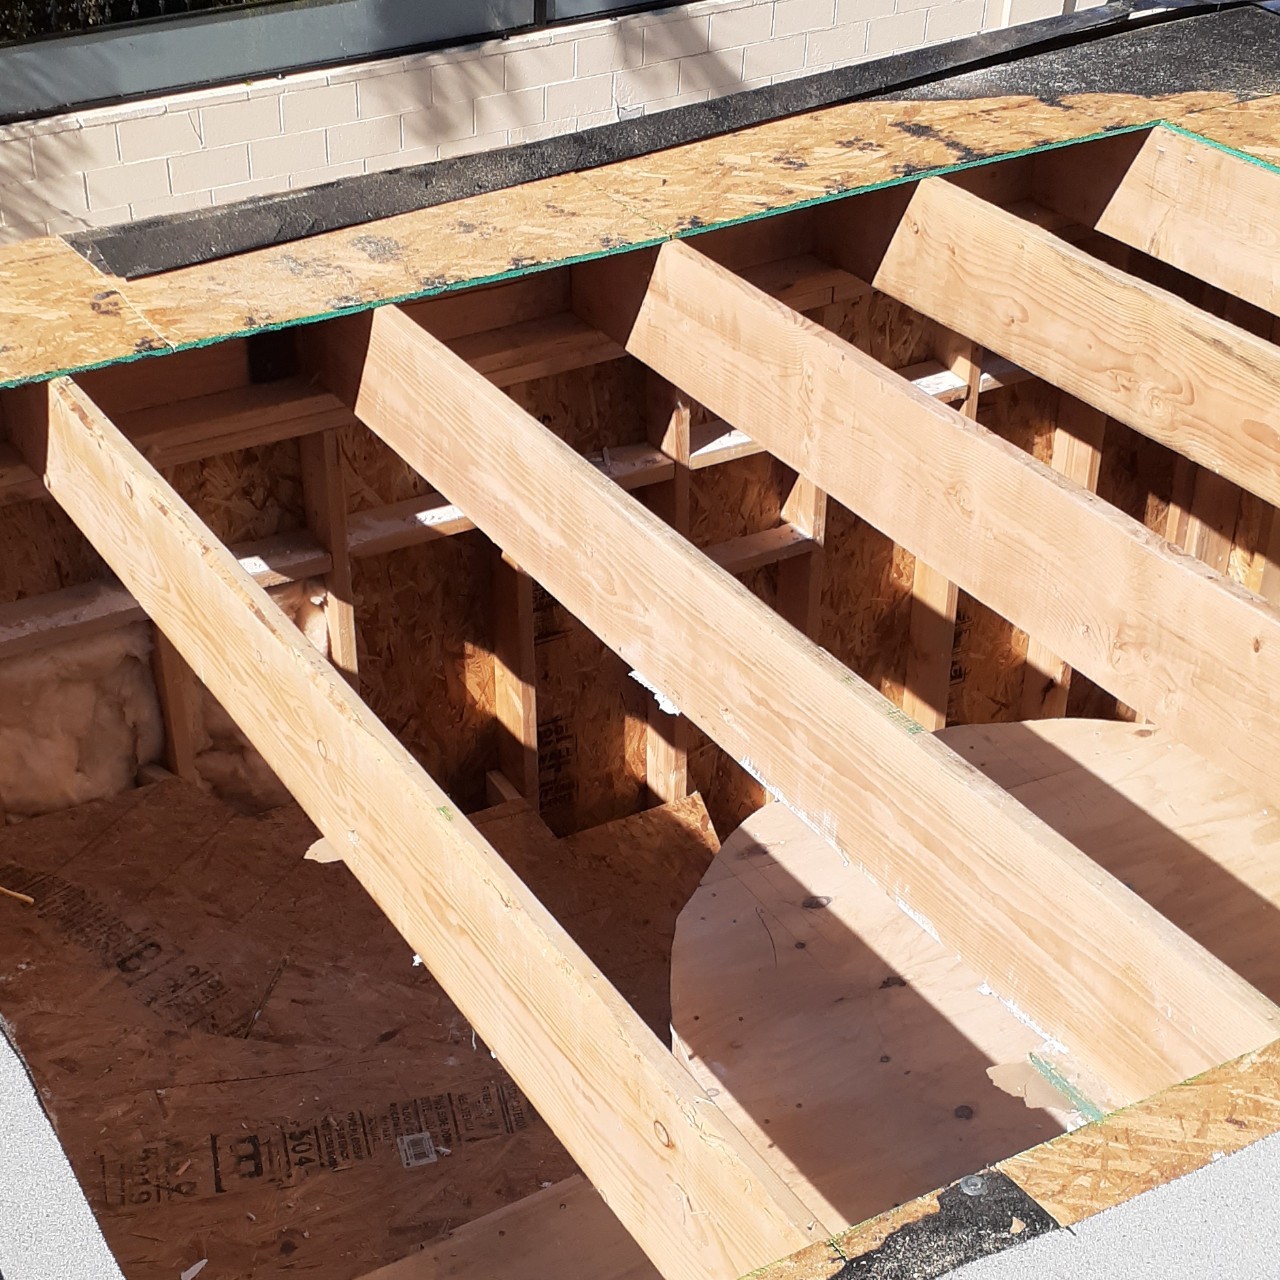 carpentry-wood-framing-second-floor-home-addition--framing-51